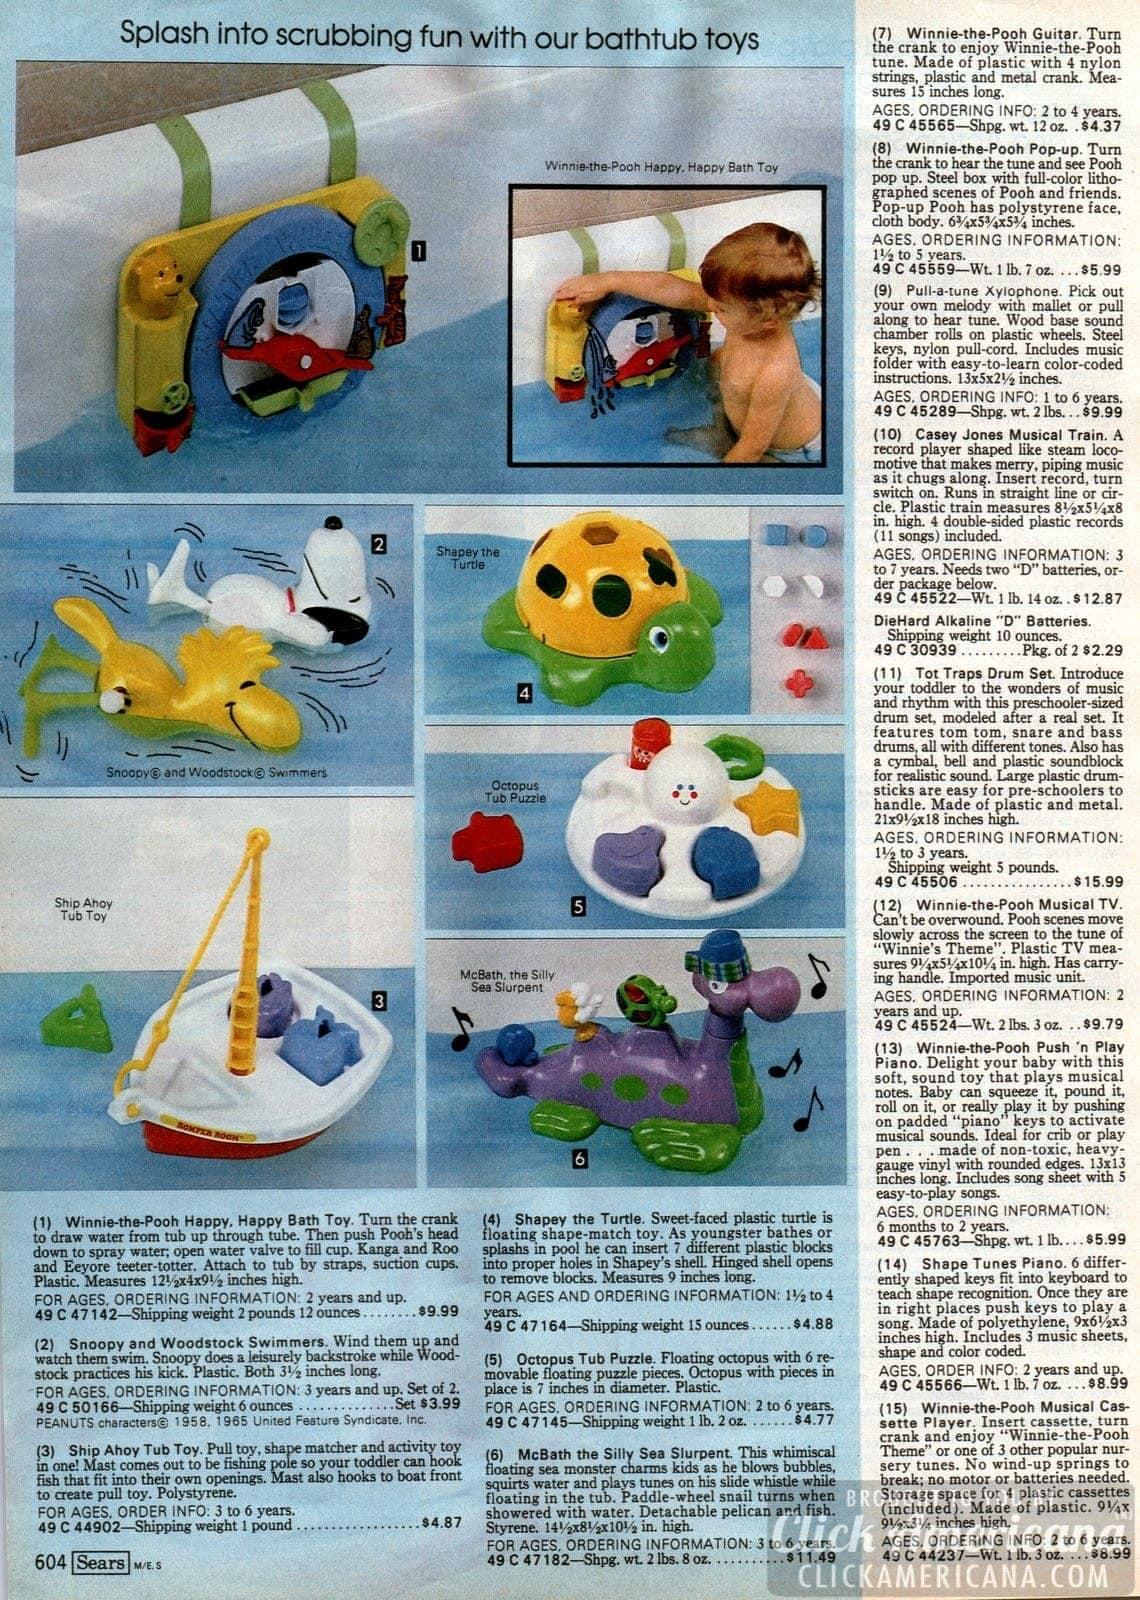 Bathtub toys and bath time fun for little kids